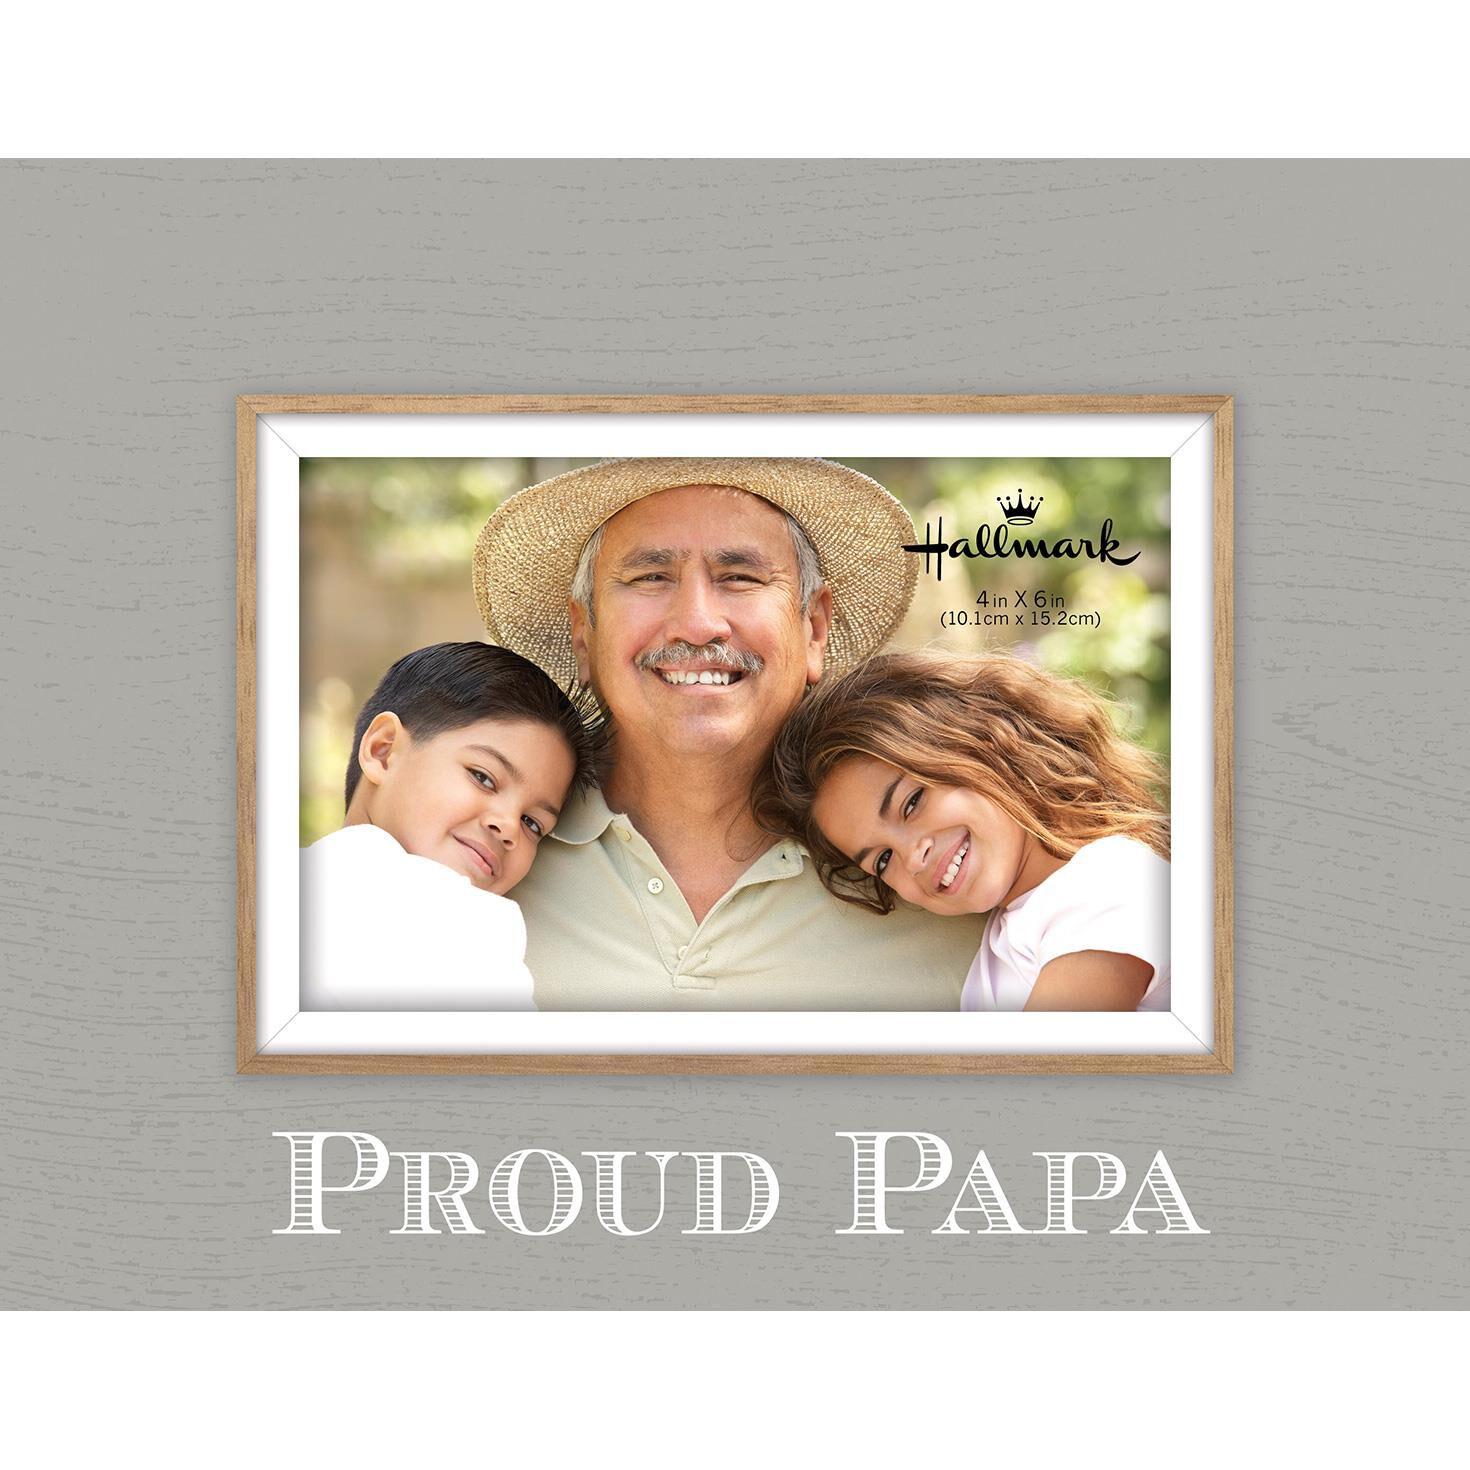 Proud Papa Malden Picture Frame, 4x6 - Picture Frames - Hallmark